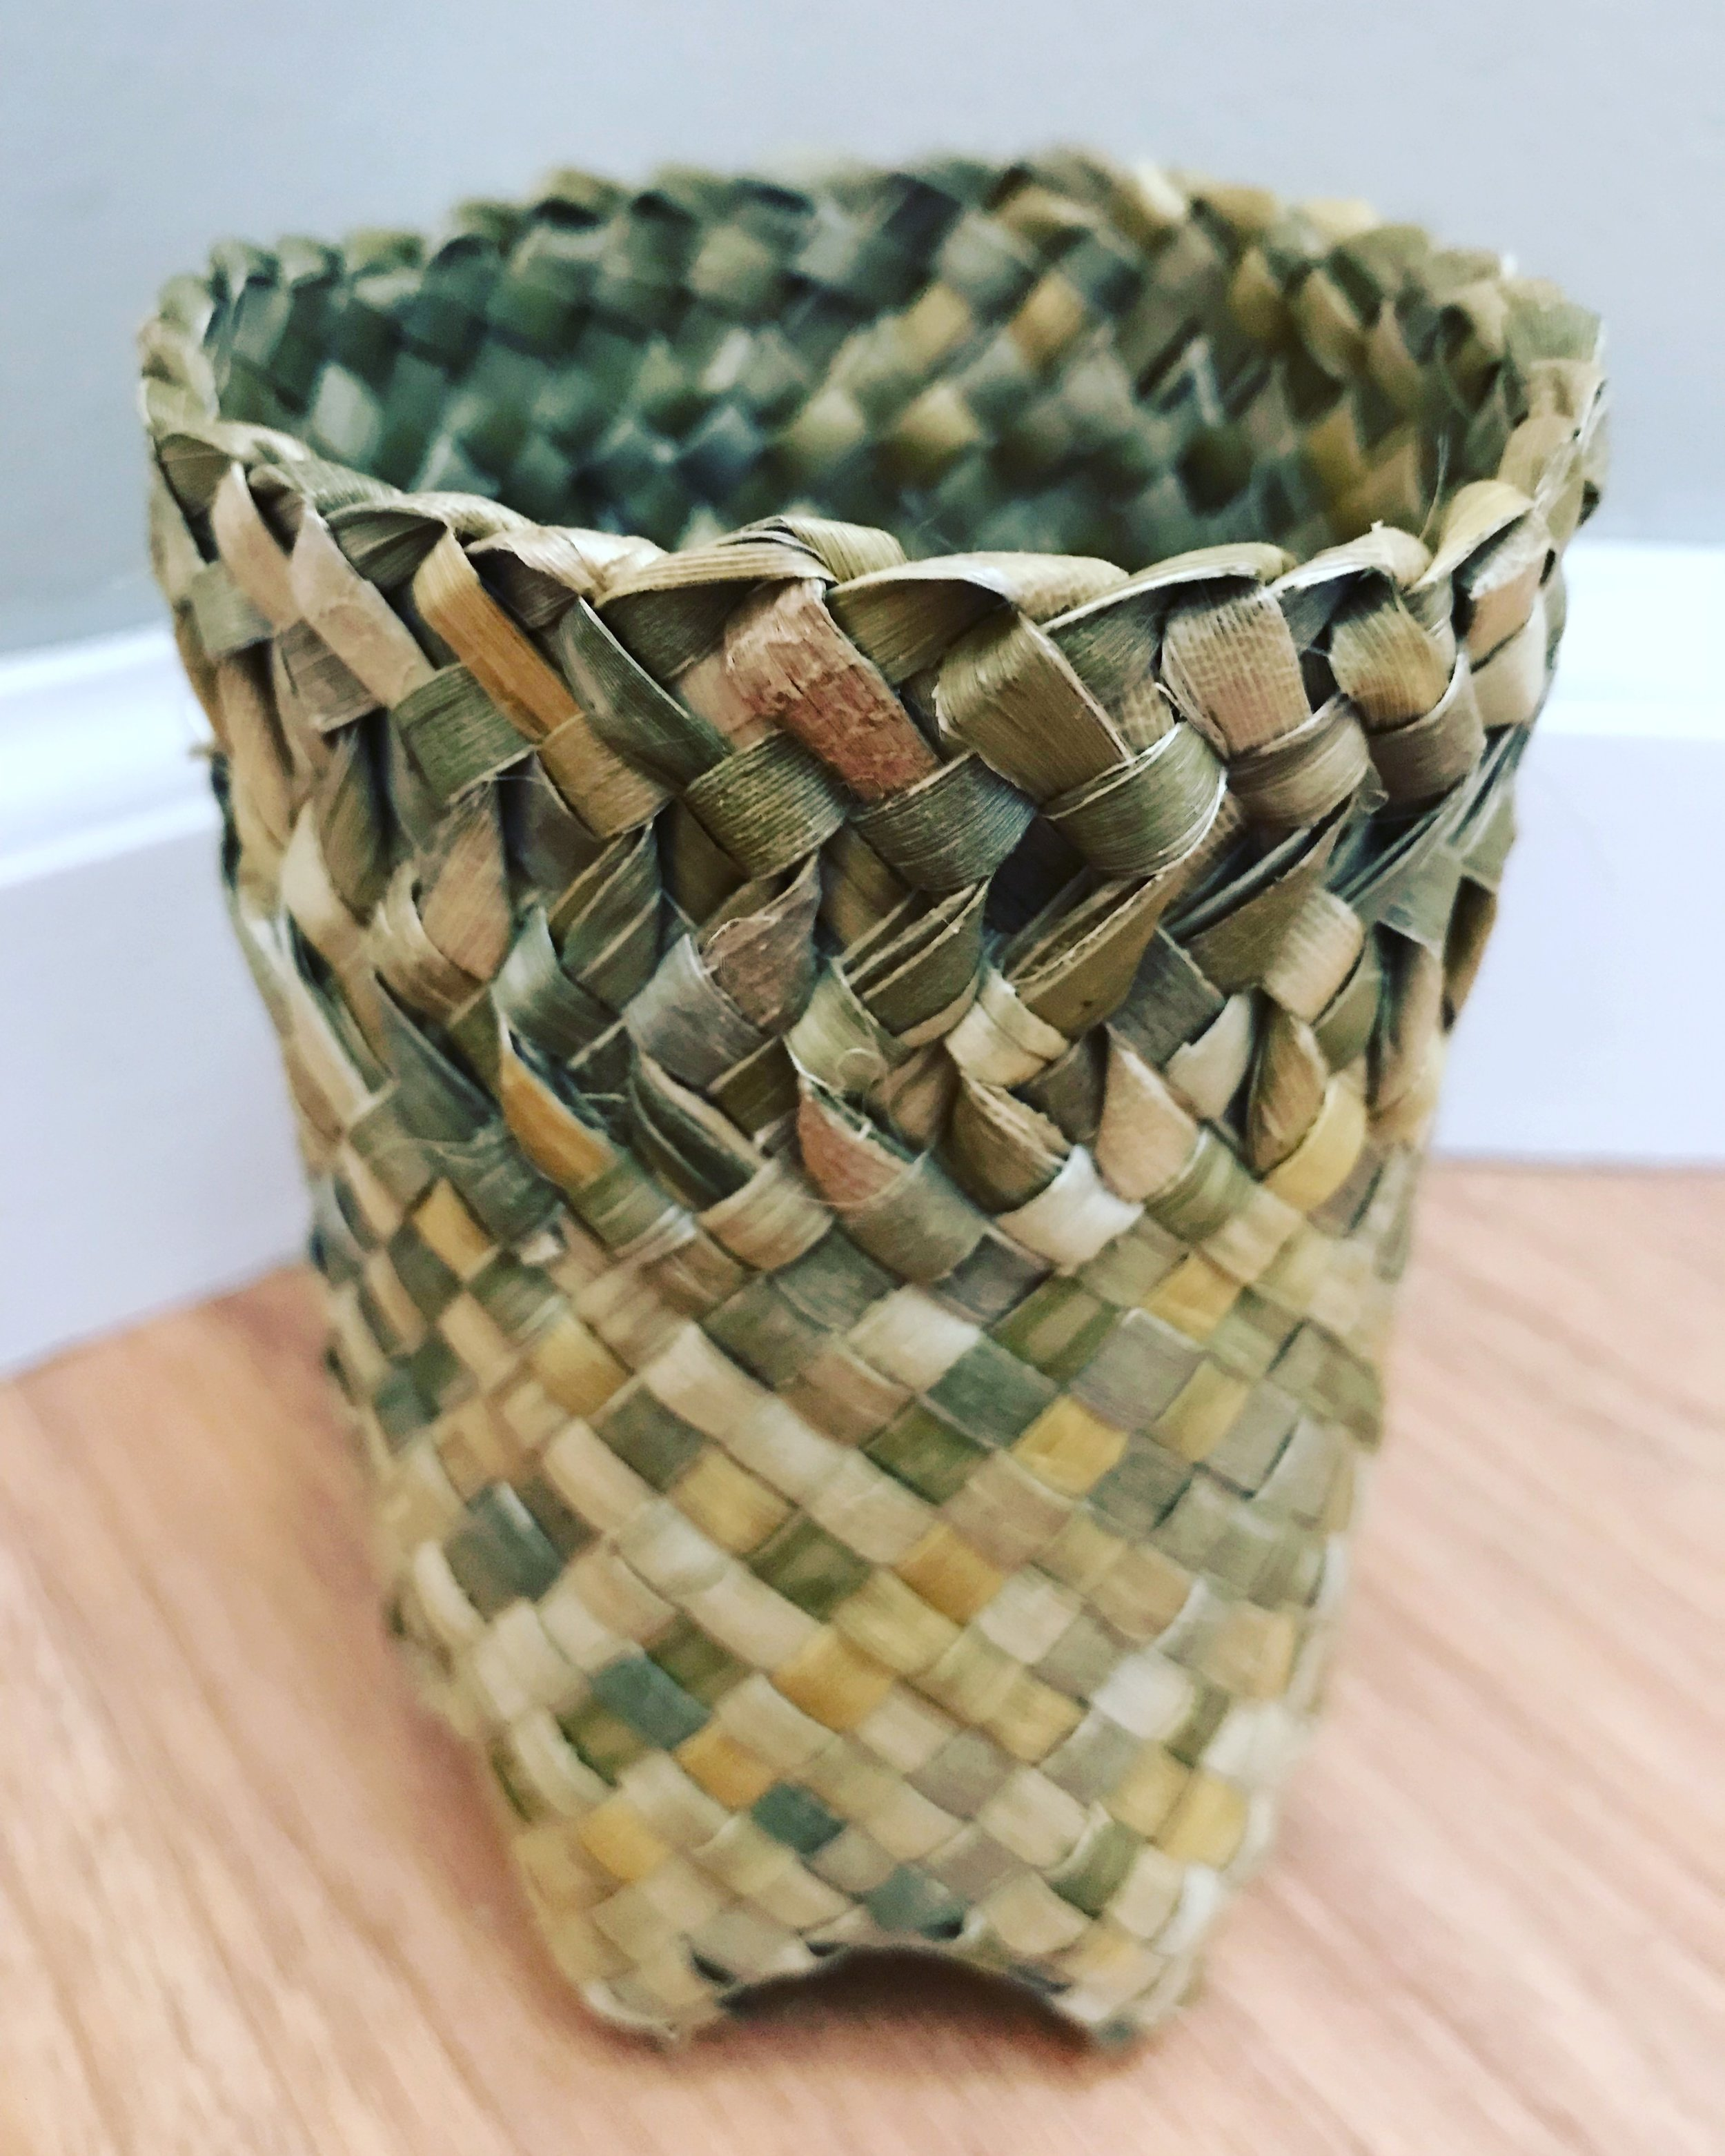 Harakeke six-footed basket